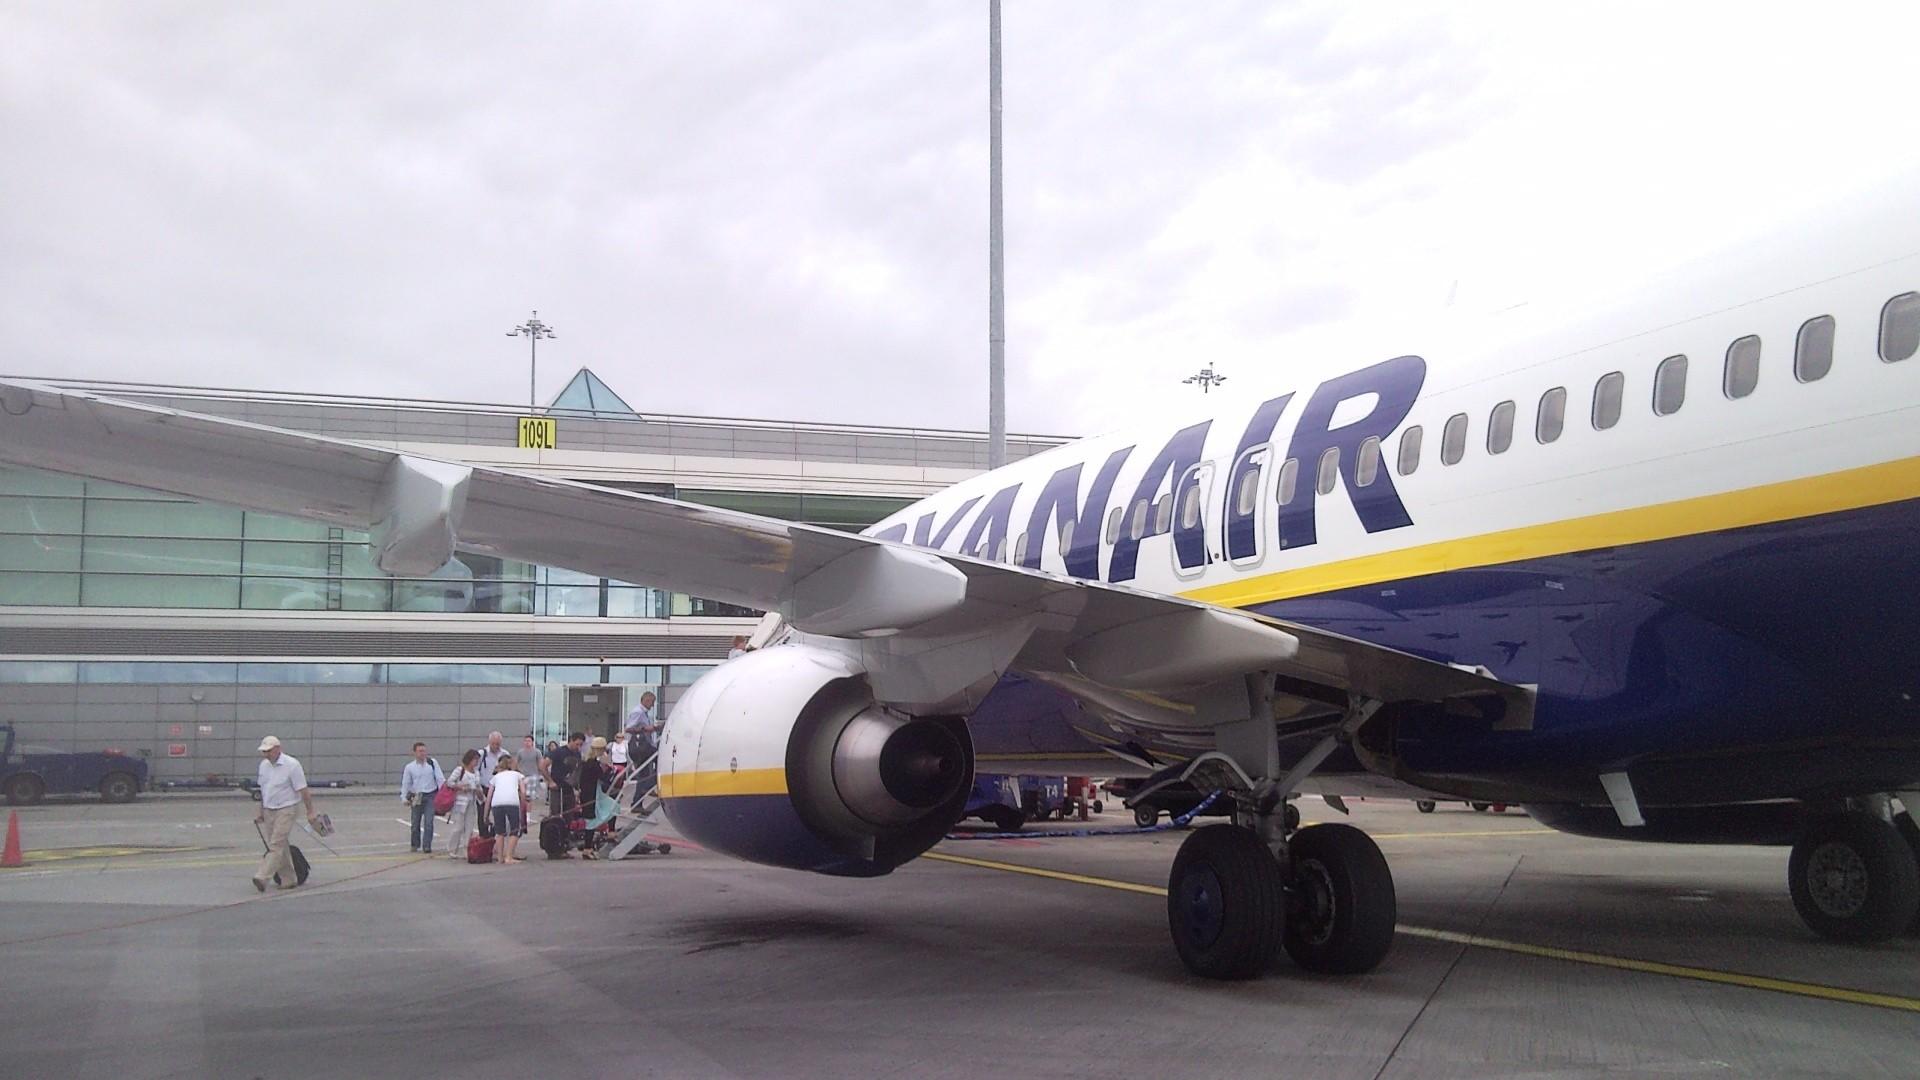 En Boeing 737 fra Ryanair ved terminalen i Dublin Airport. (Foto: Tonkie)